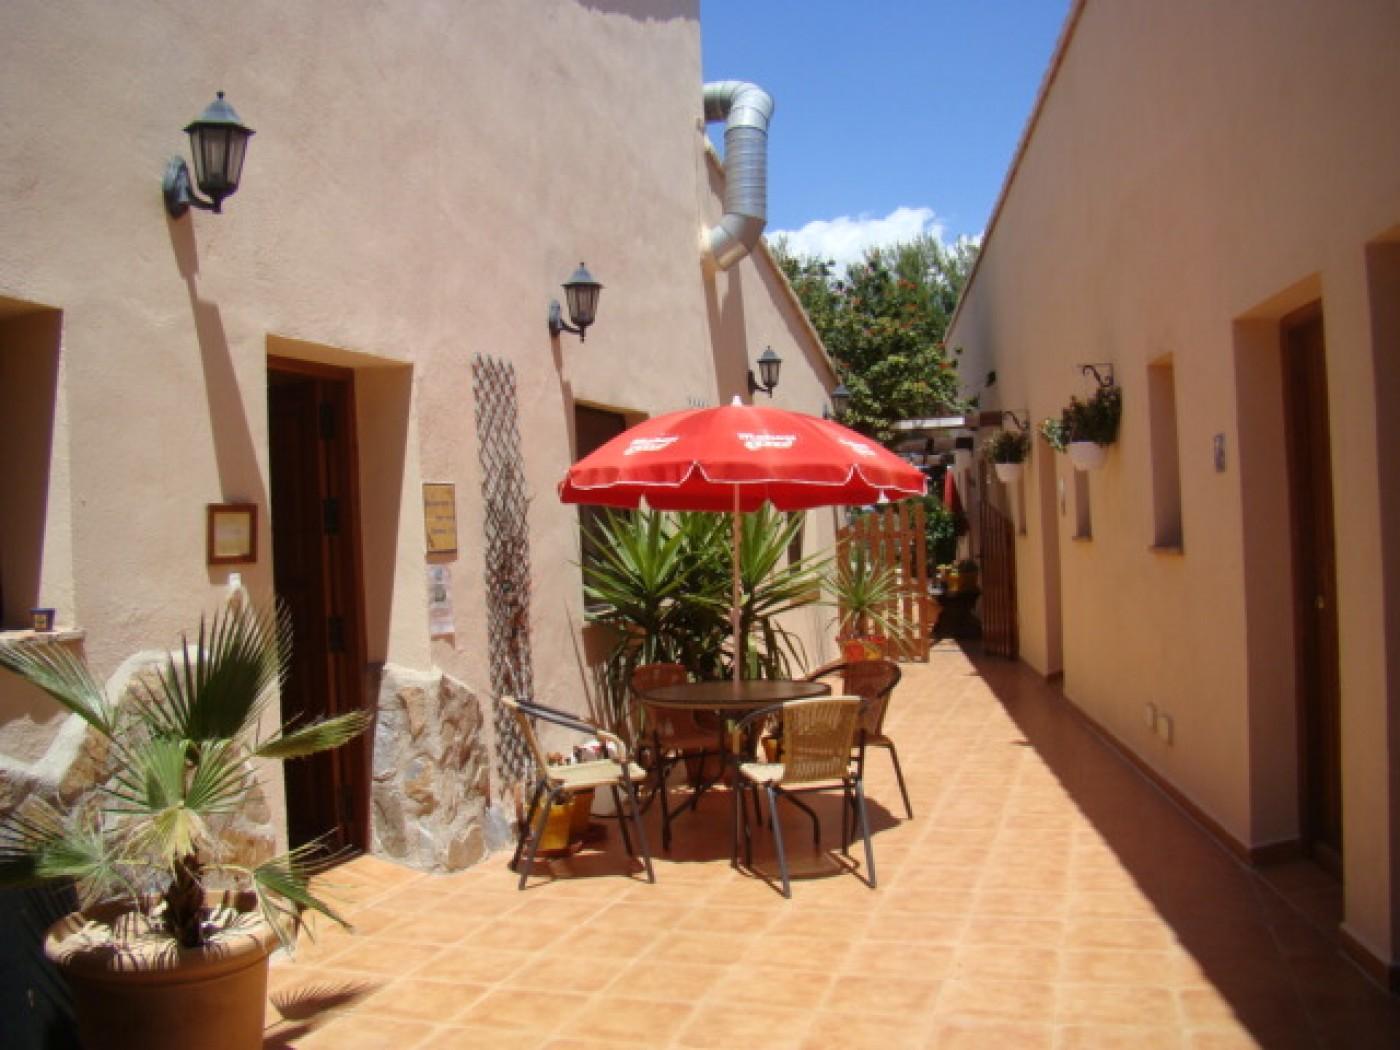 La Mariposa Hotel, Restaurant and Activity Centre Sierra Espuña